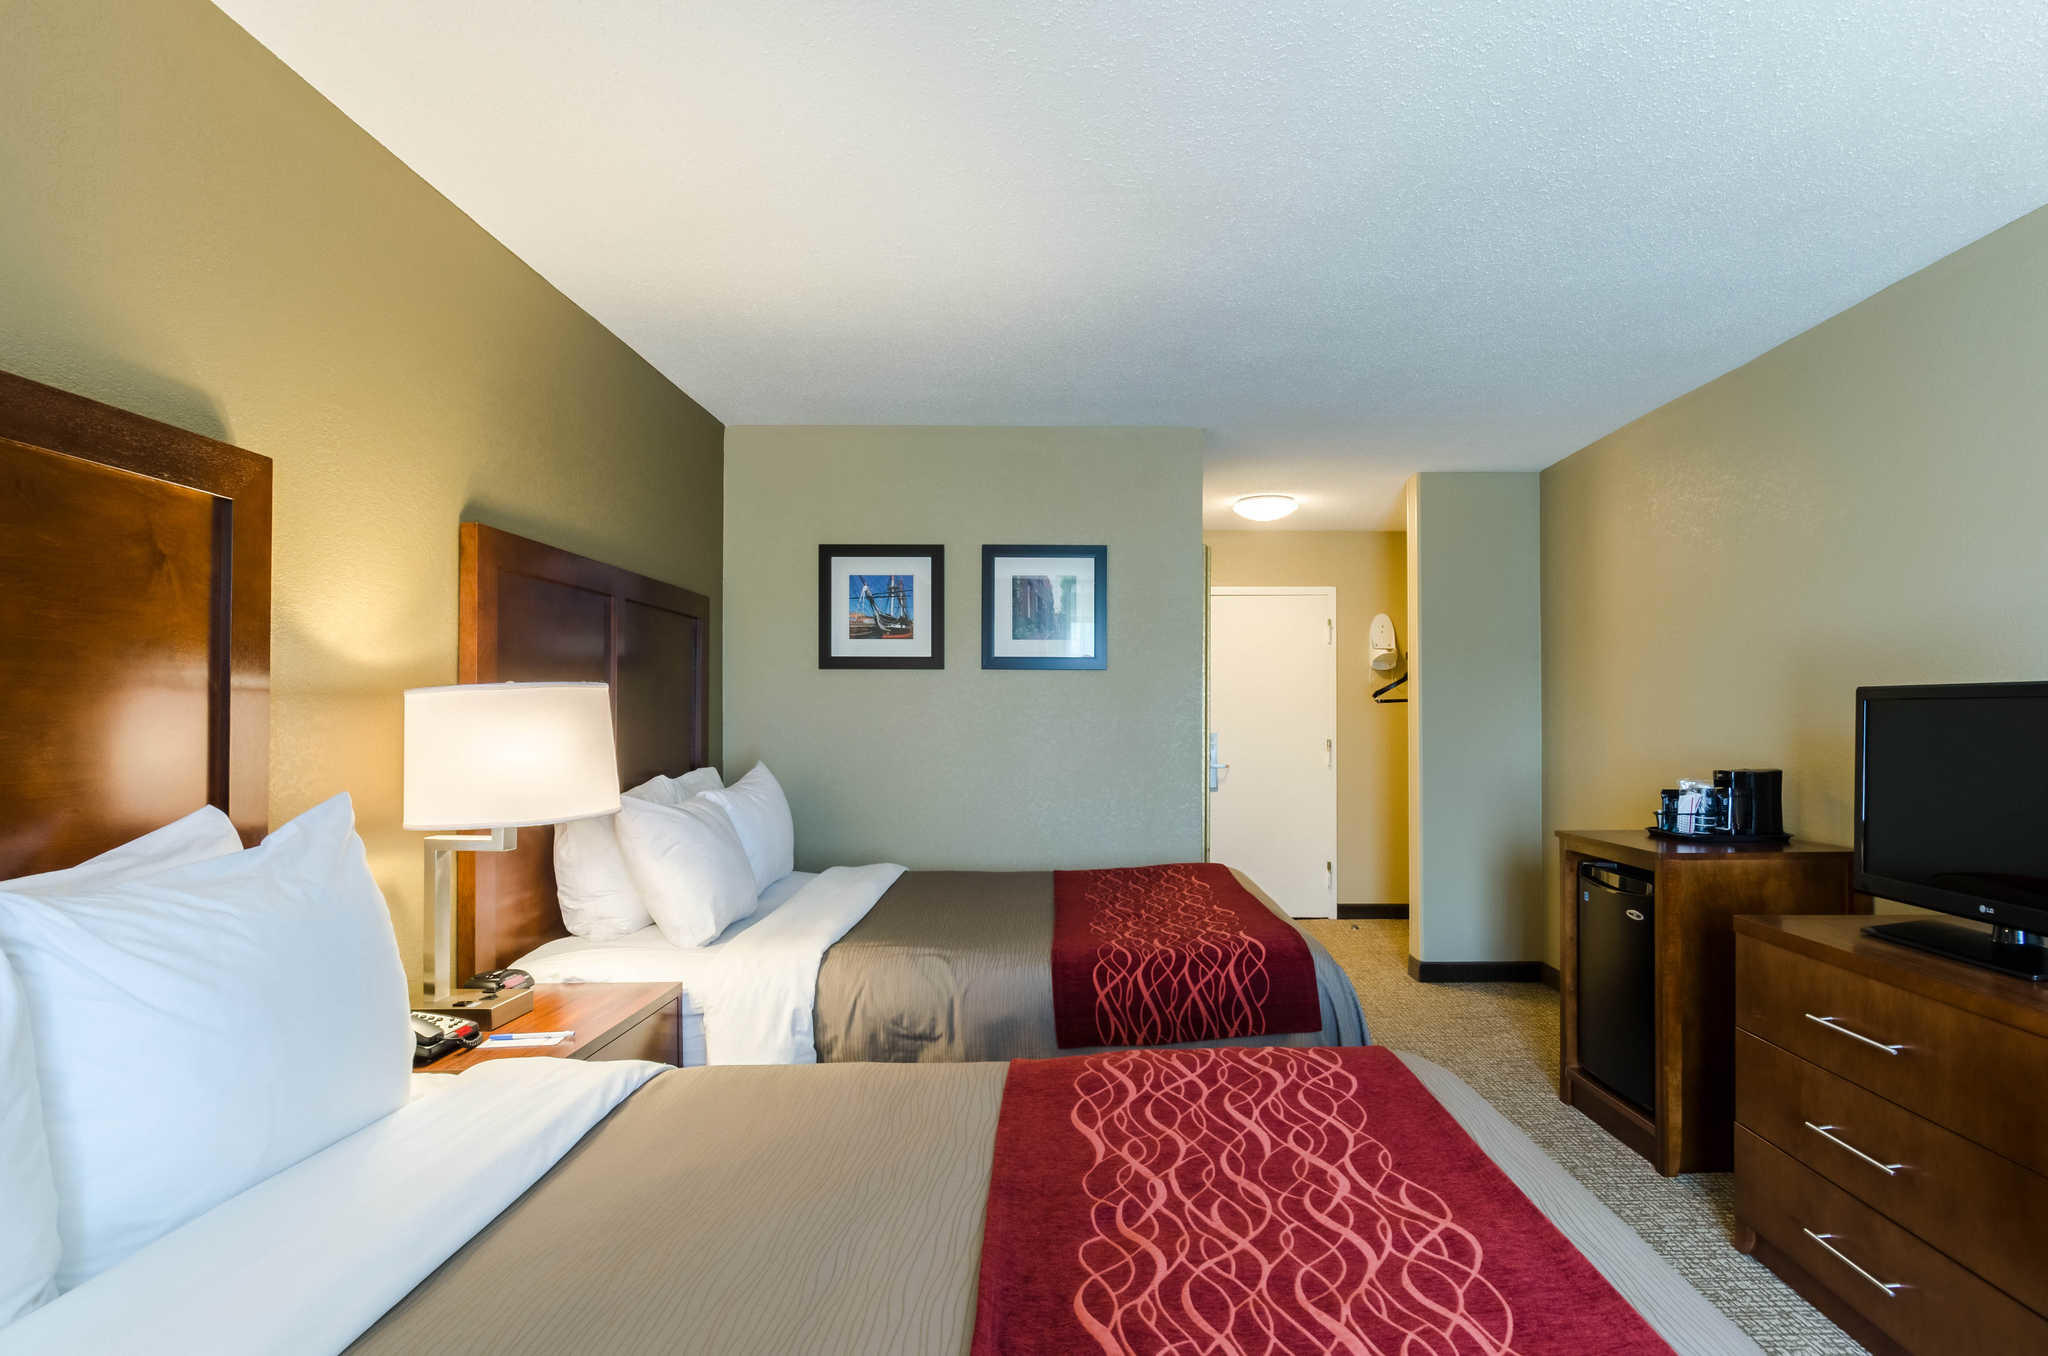 Comfort Inn Randolph - Boston image 15